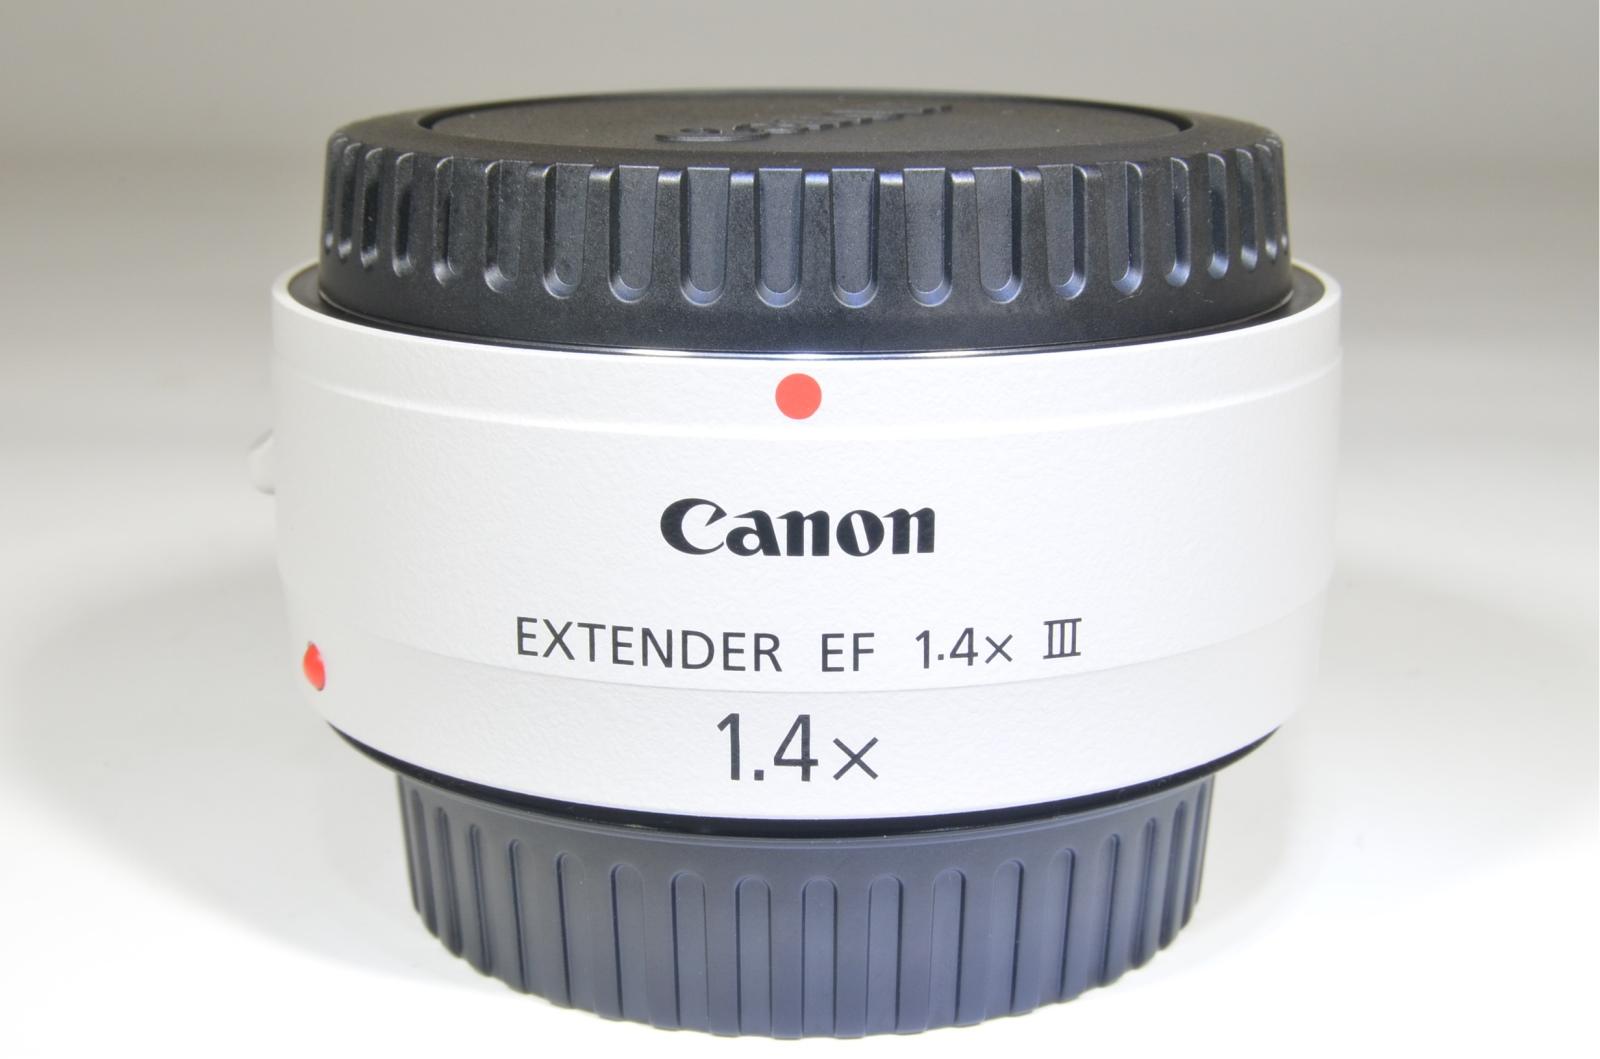 canon extender ef 1.4 x iii teleconverter